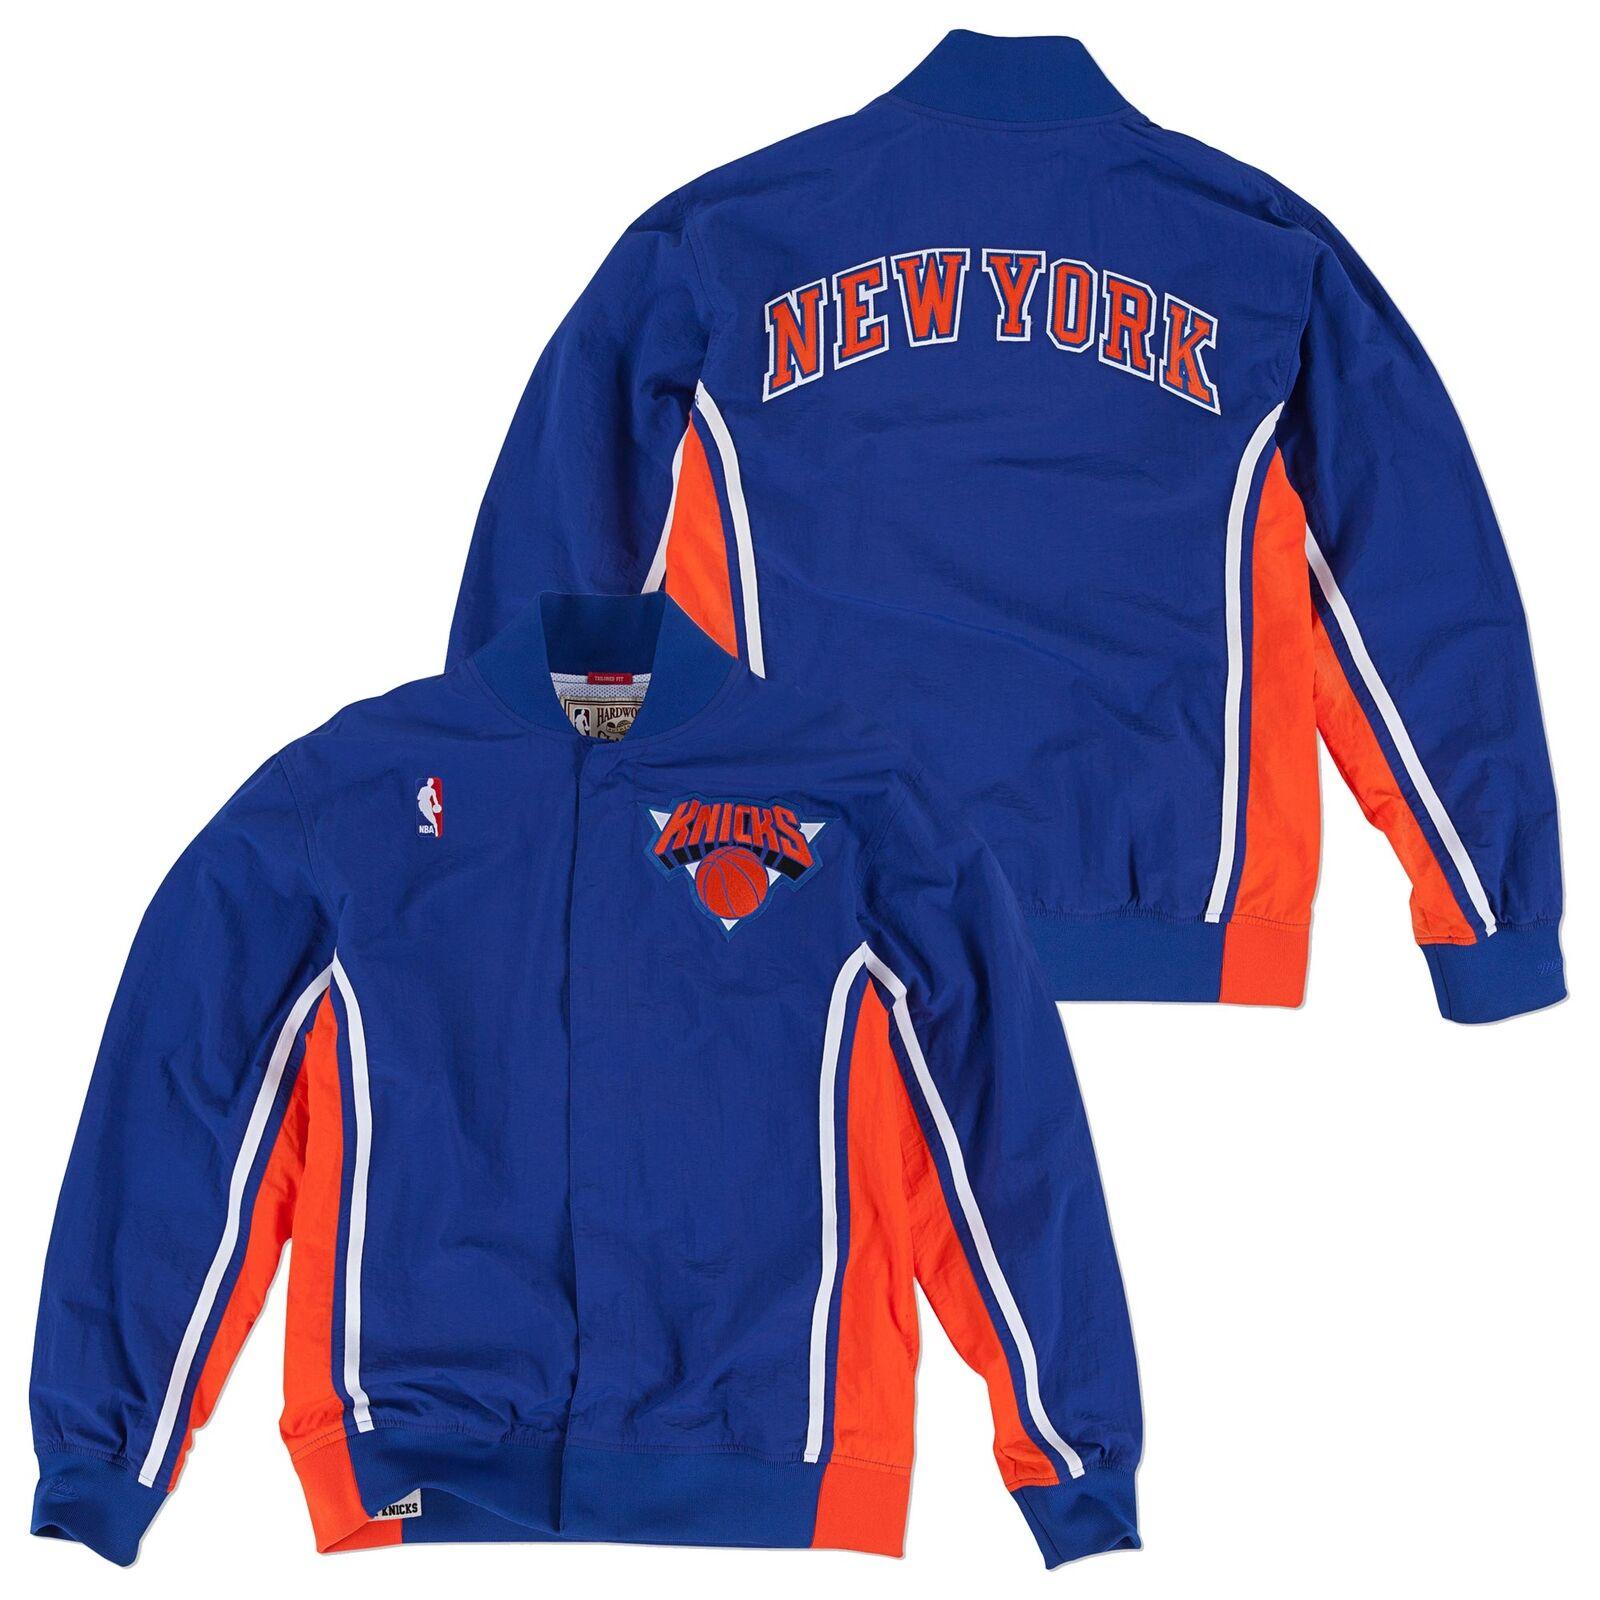 NBA New York Knicks Hardwood Classics 92-93 Basketball Training Jacke Herren